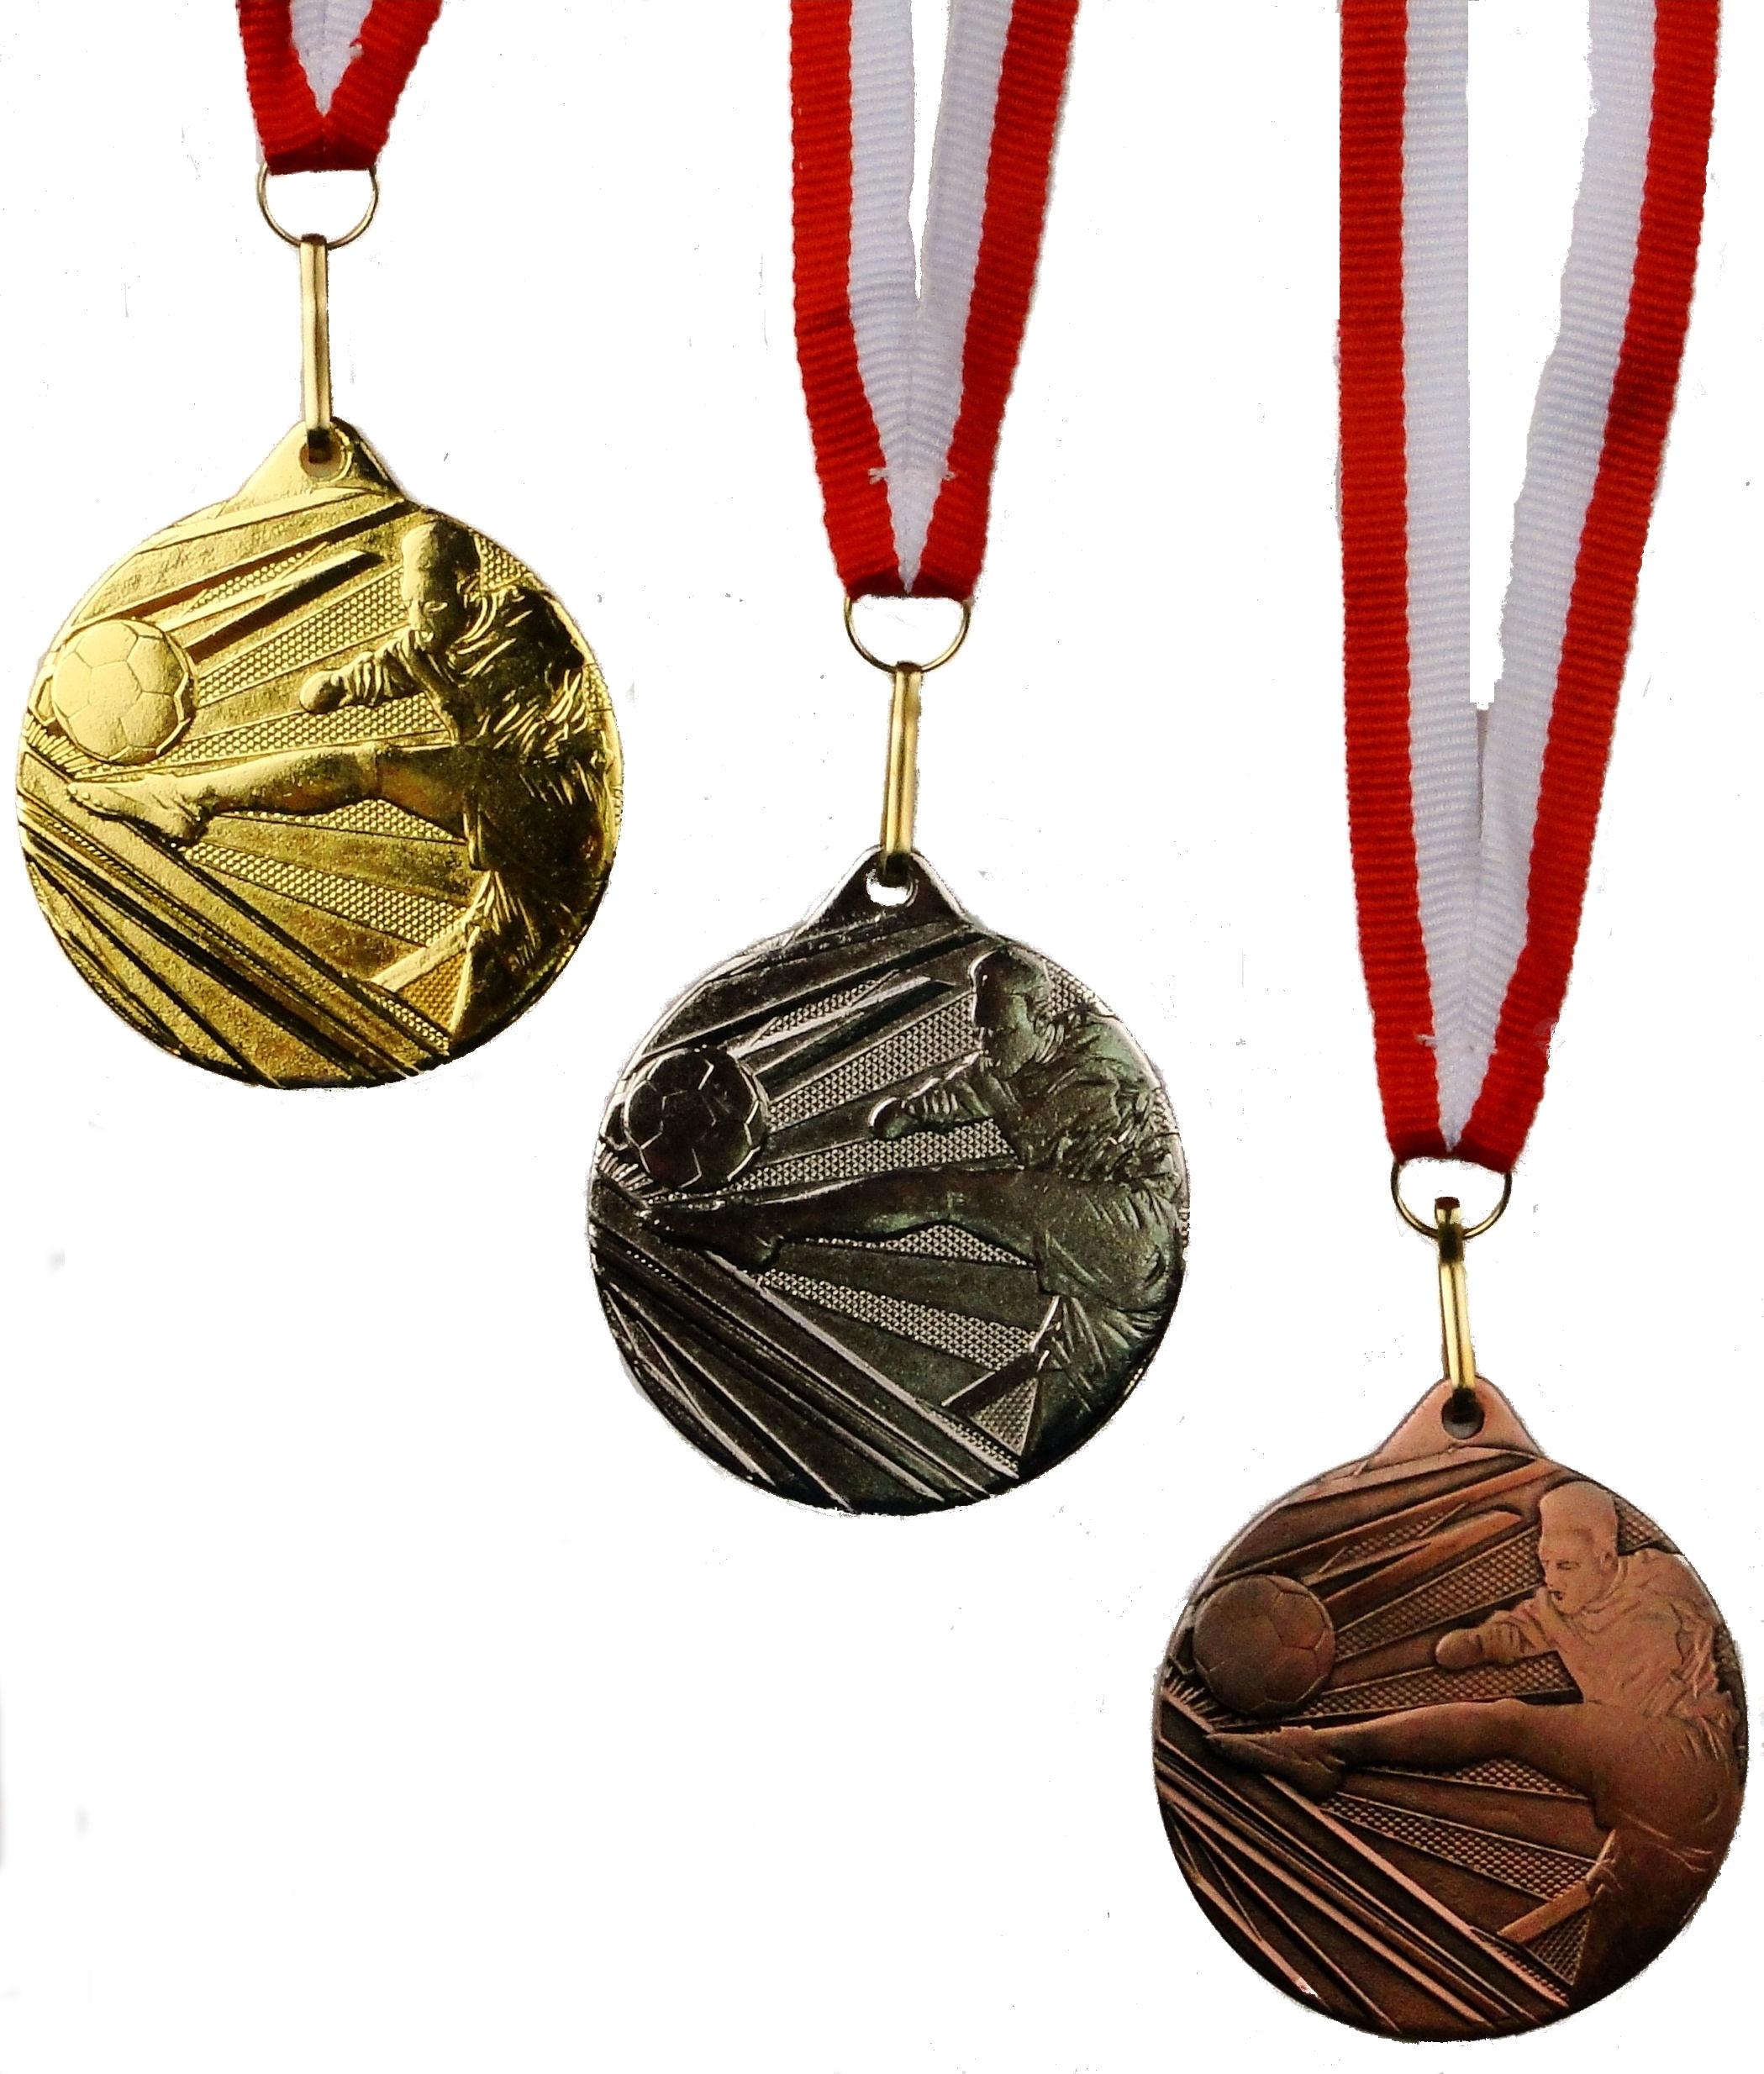 Medaily Šport Futbal Set Gold Silver Bronze